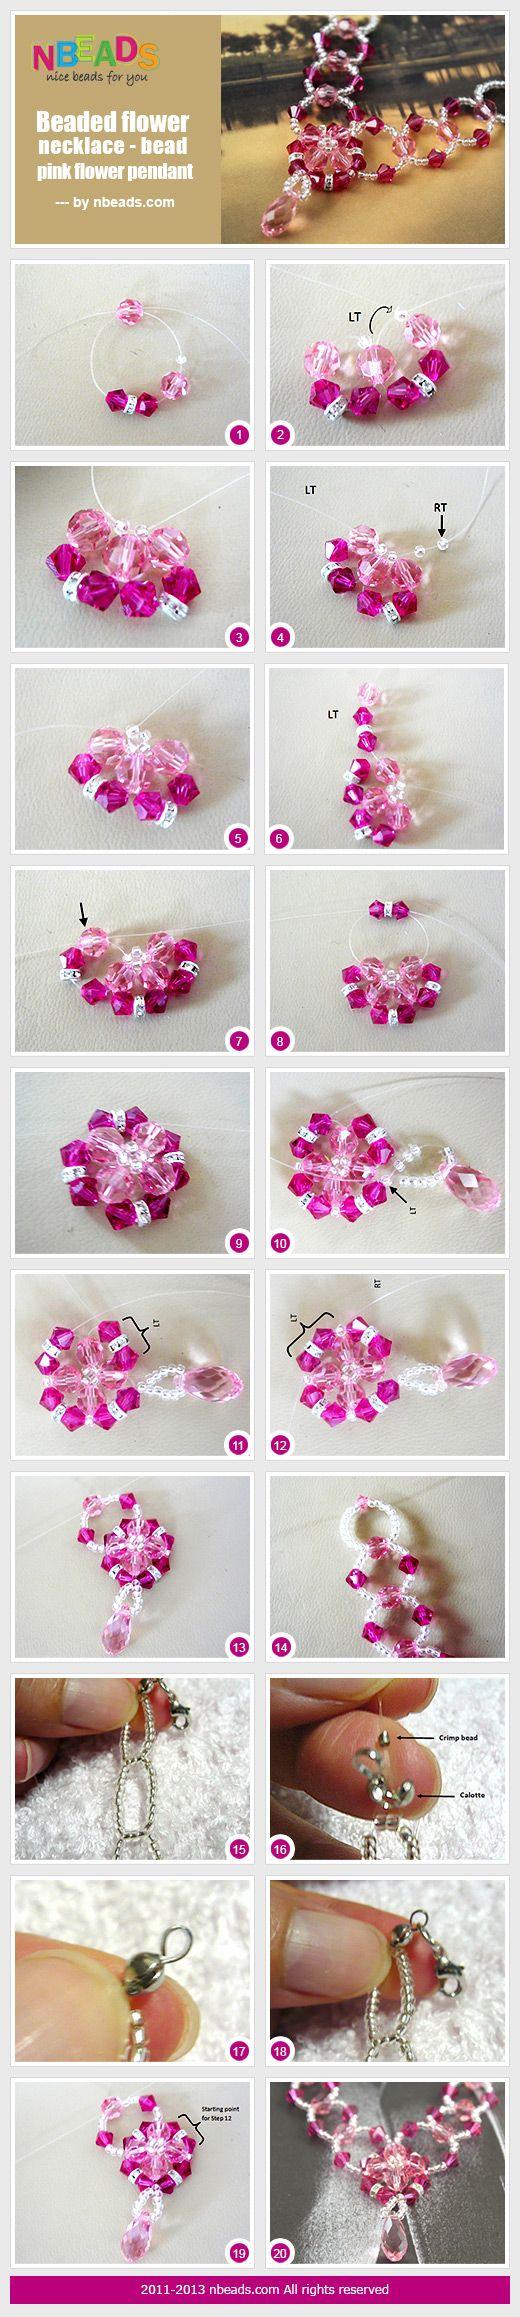 beaded flower necklace - bead pink flower pendant